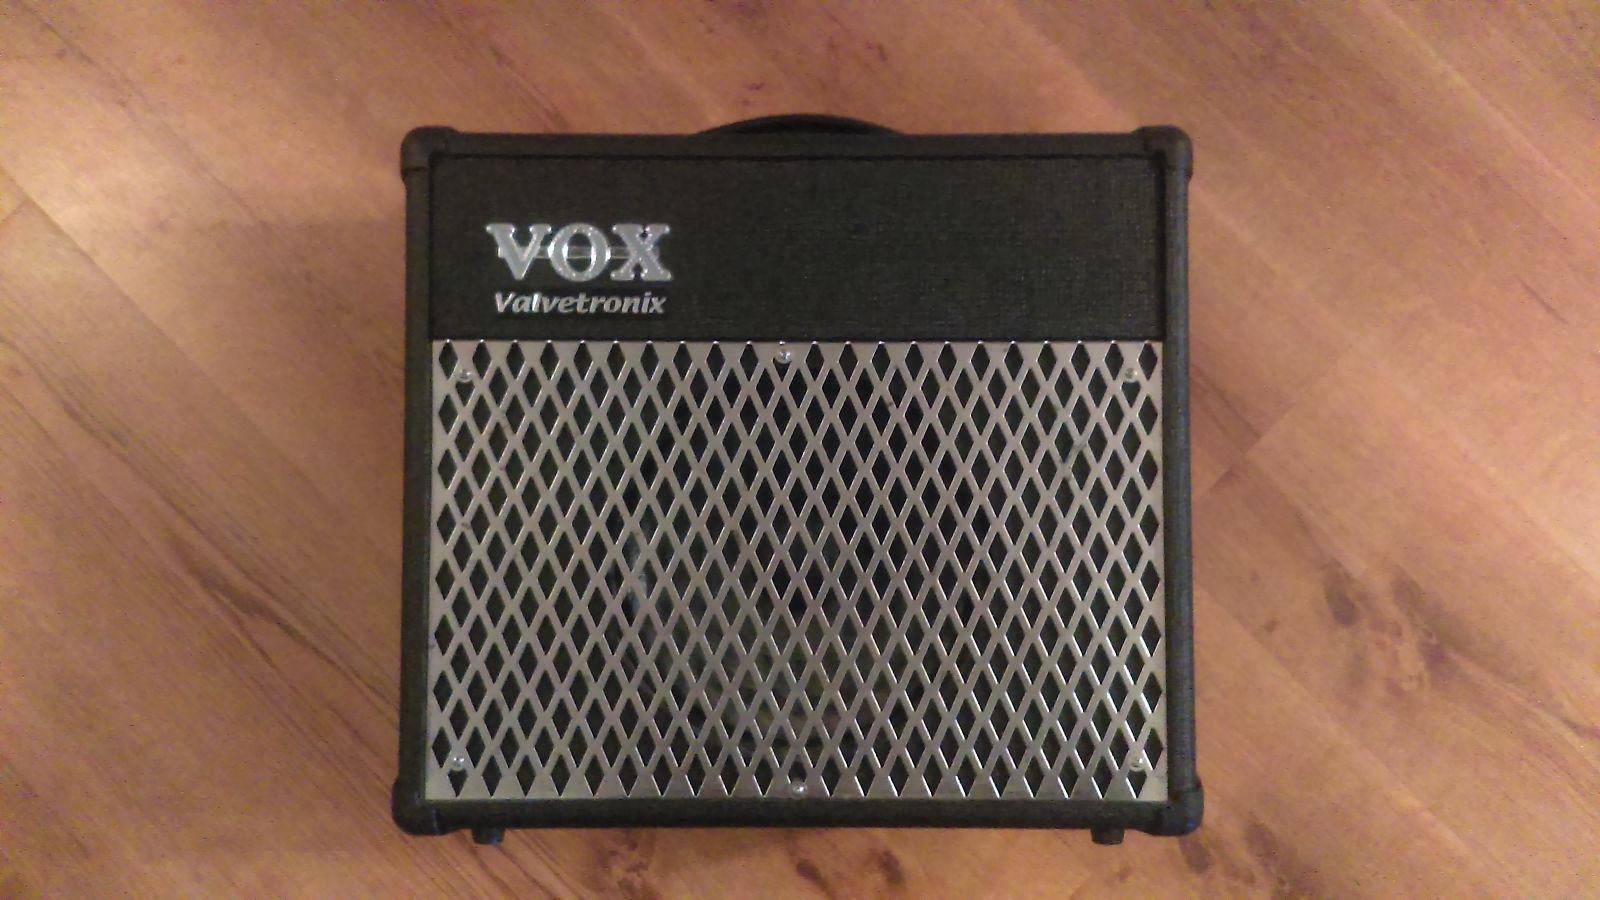 vox valvetronix ad15vt 15 watt 1x8 modeling guitar reverb. Black Bedroom Furniture Sets. Home Design Ideas